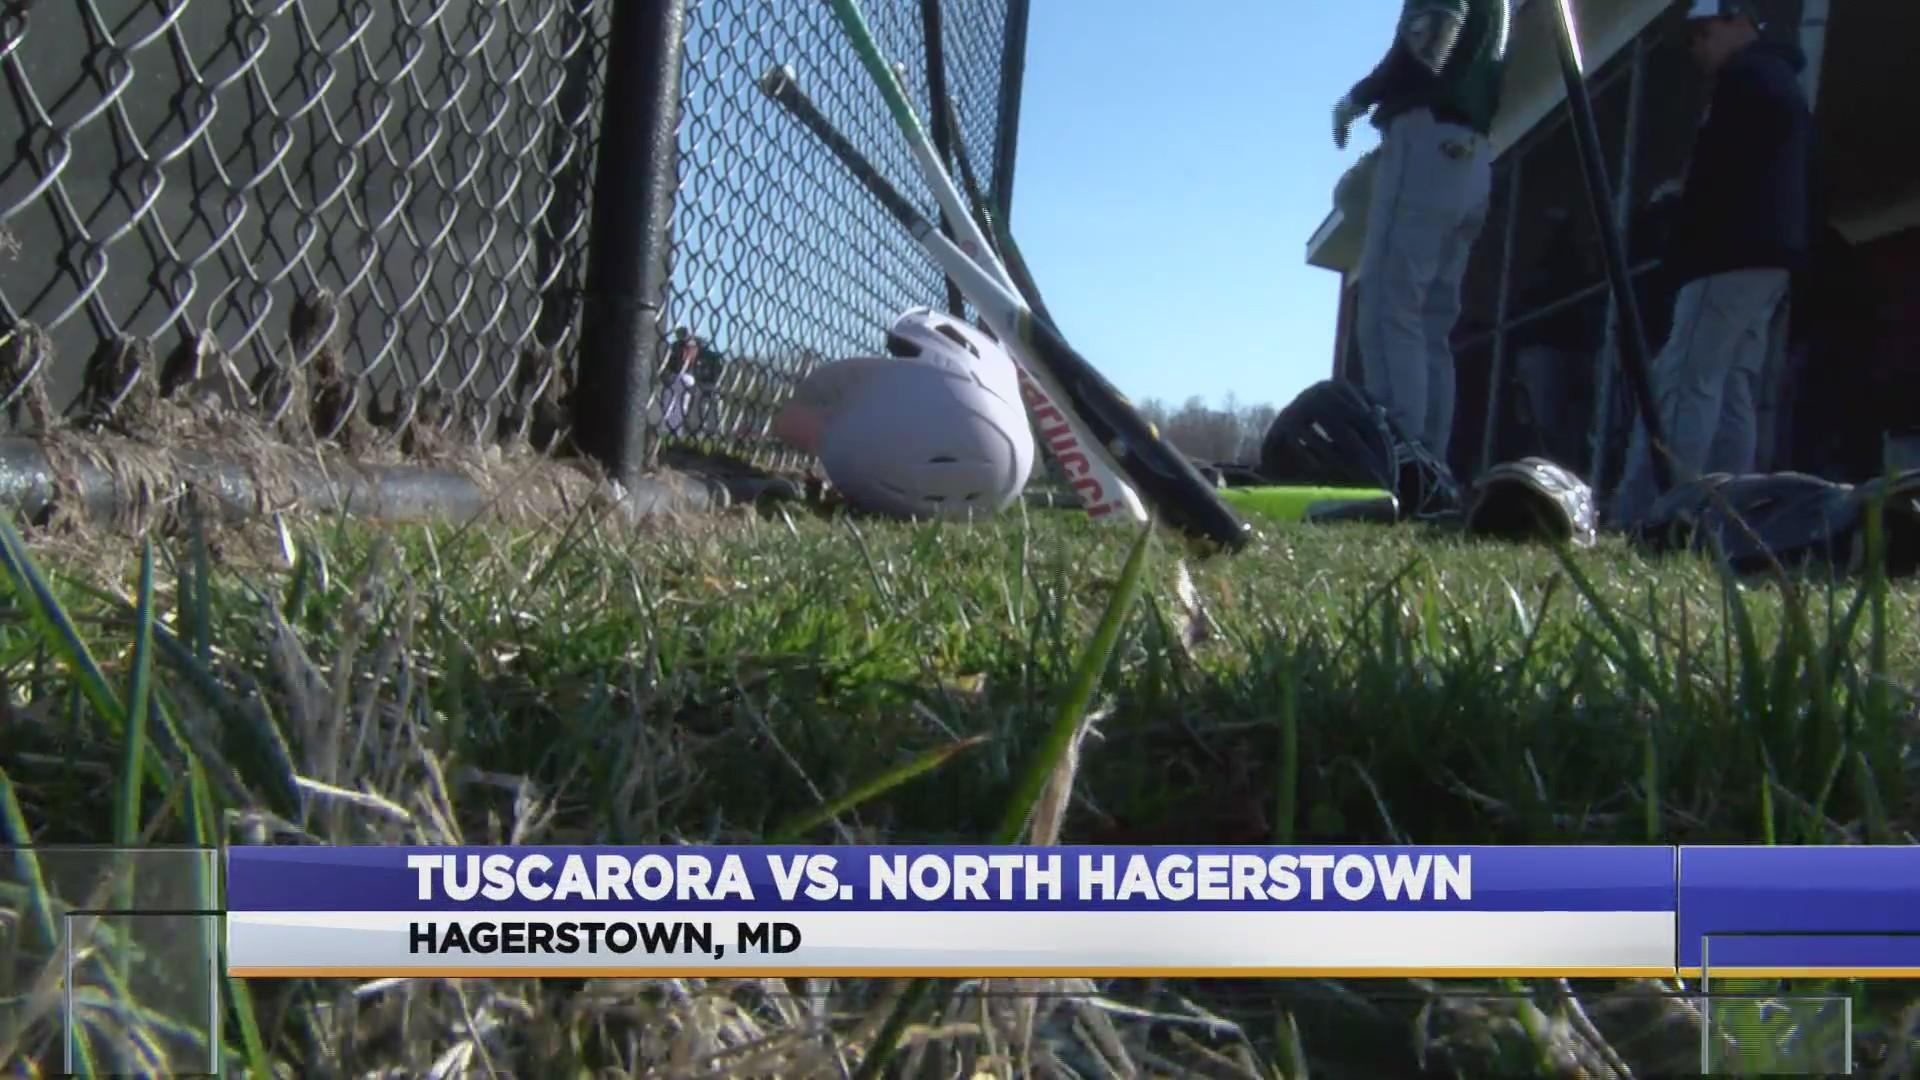 Tuscarora_vs__North_Hagerstown_Baseball_0_20190404030433